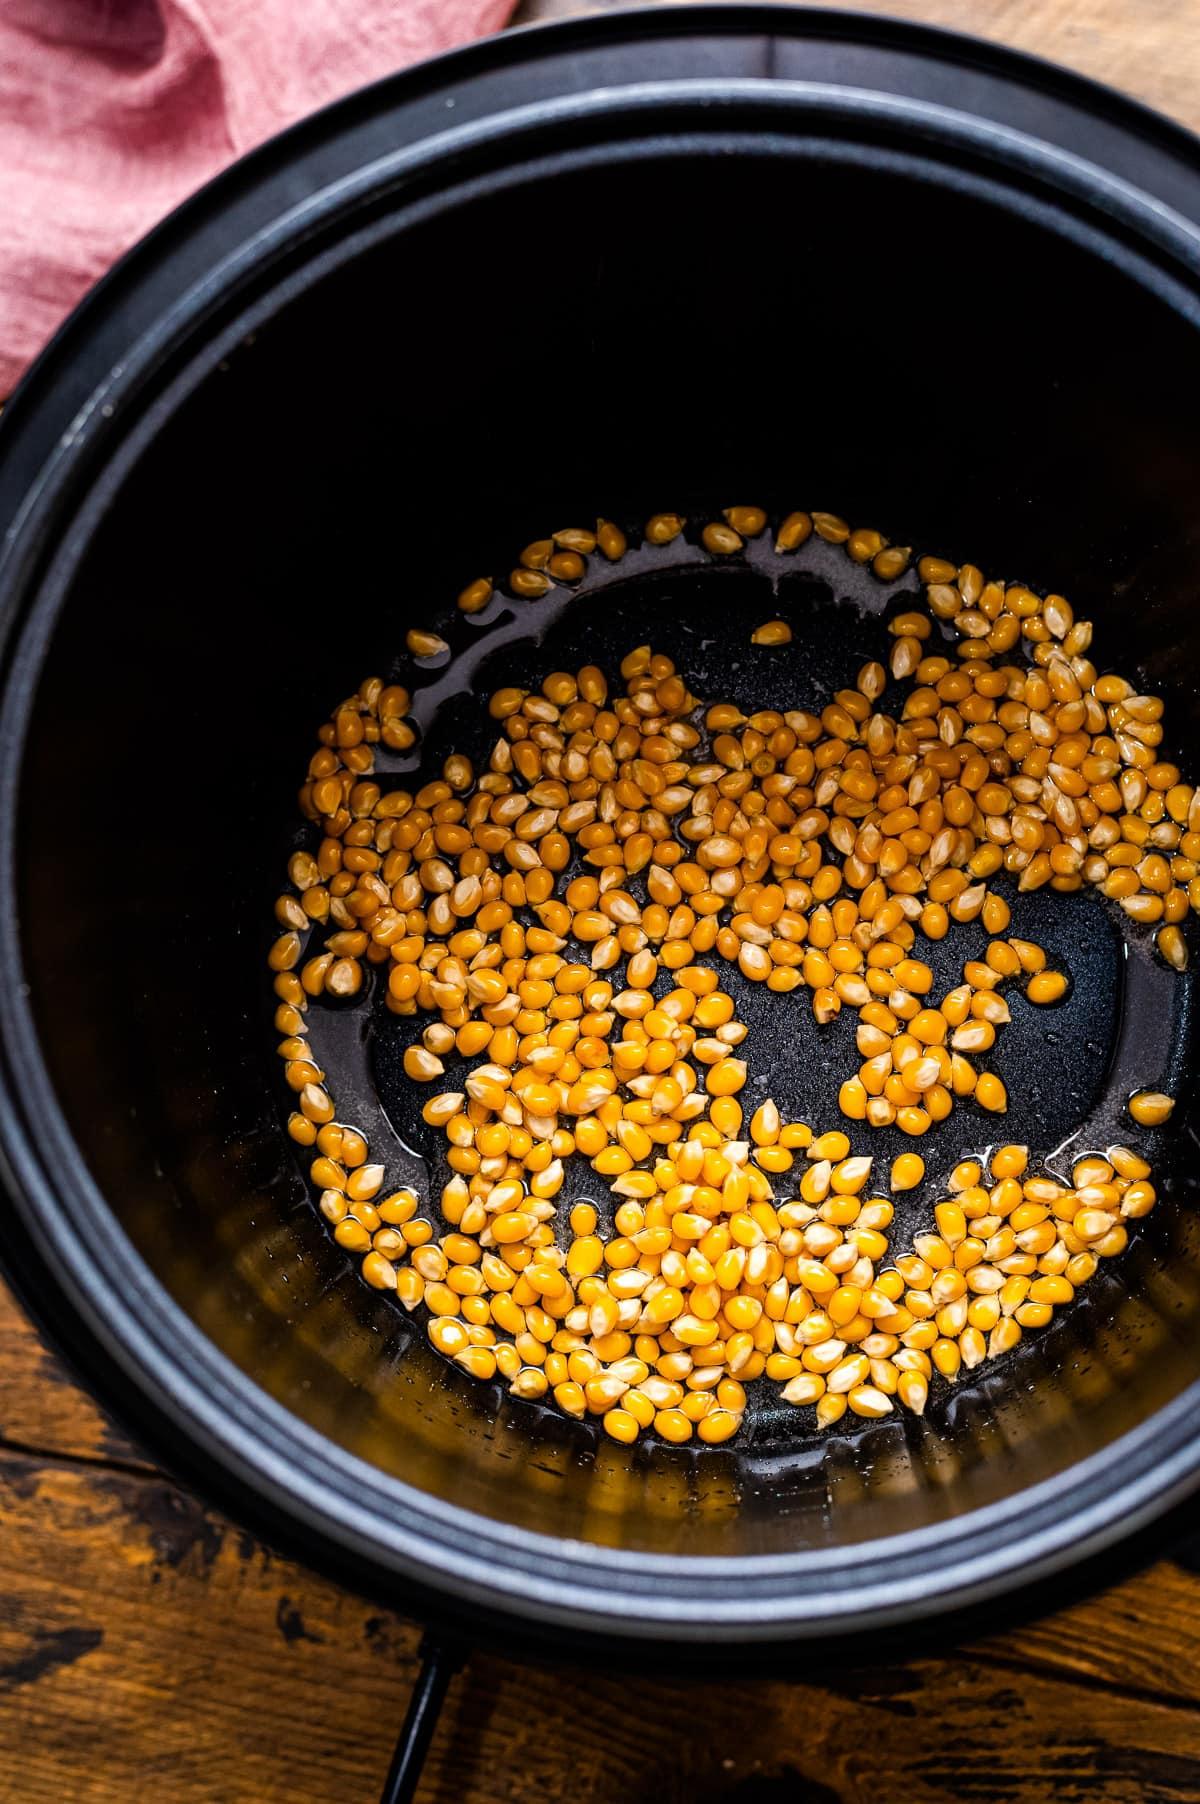 Instant Pot with popcorn kernels in oil